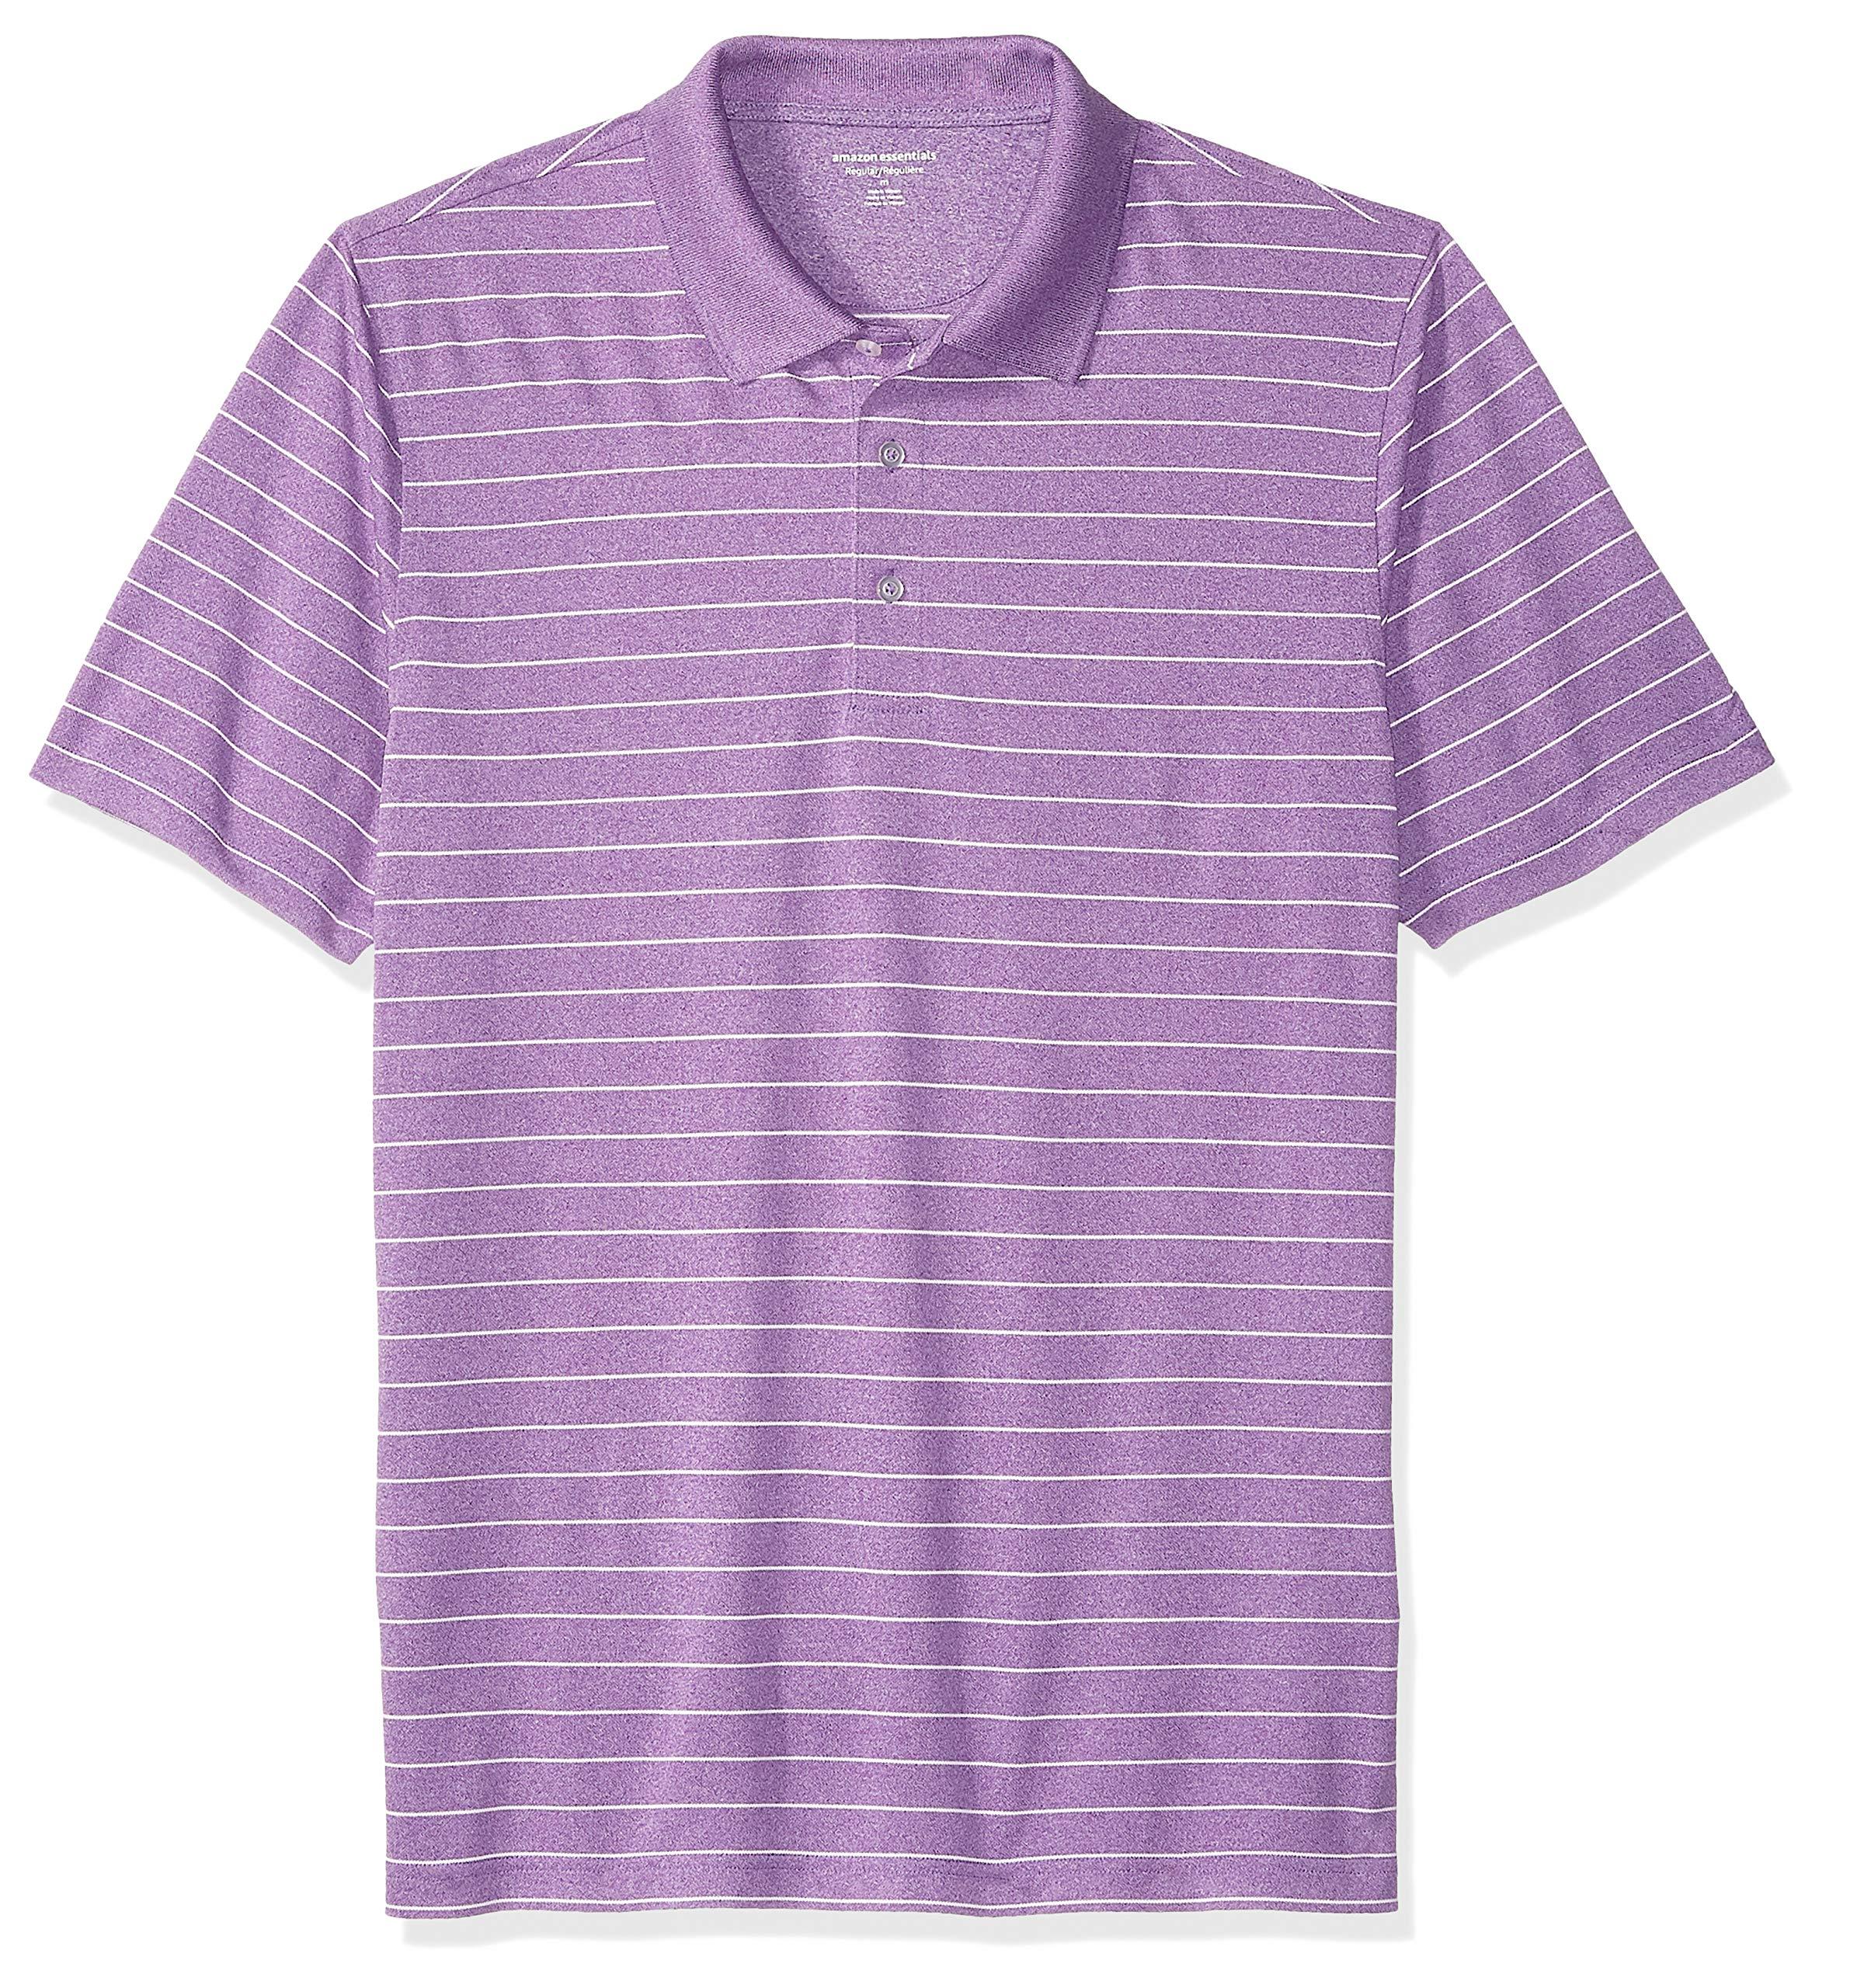 Amazon Essentials Men's Regular-Fit Quick-Dry Golf Polo Shirt, Purple Stripe, X-Small